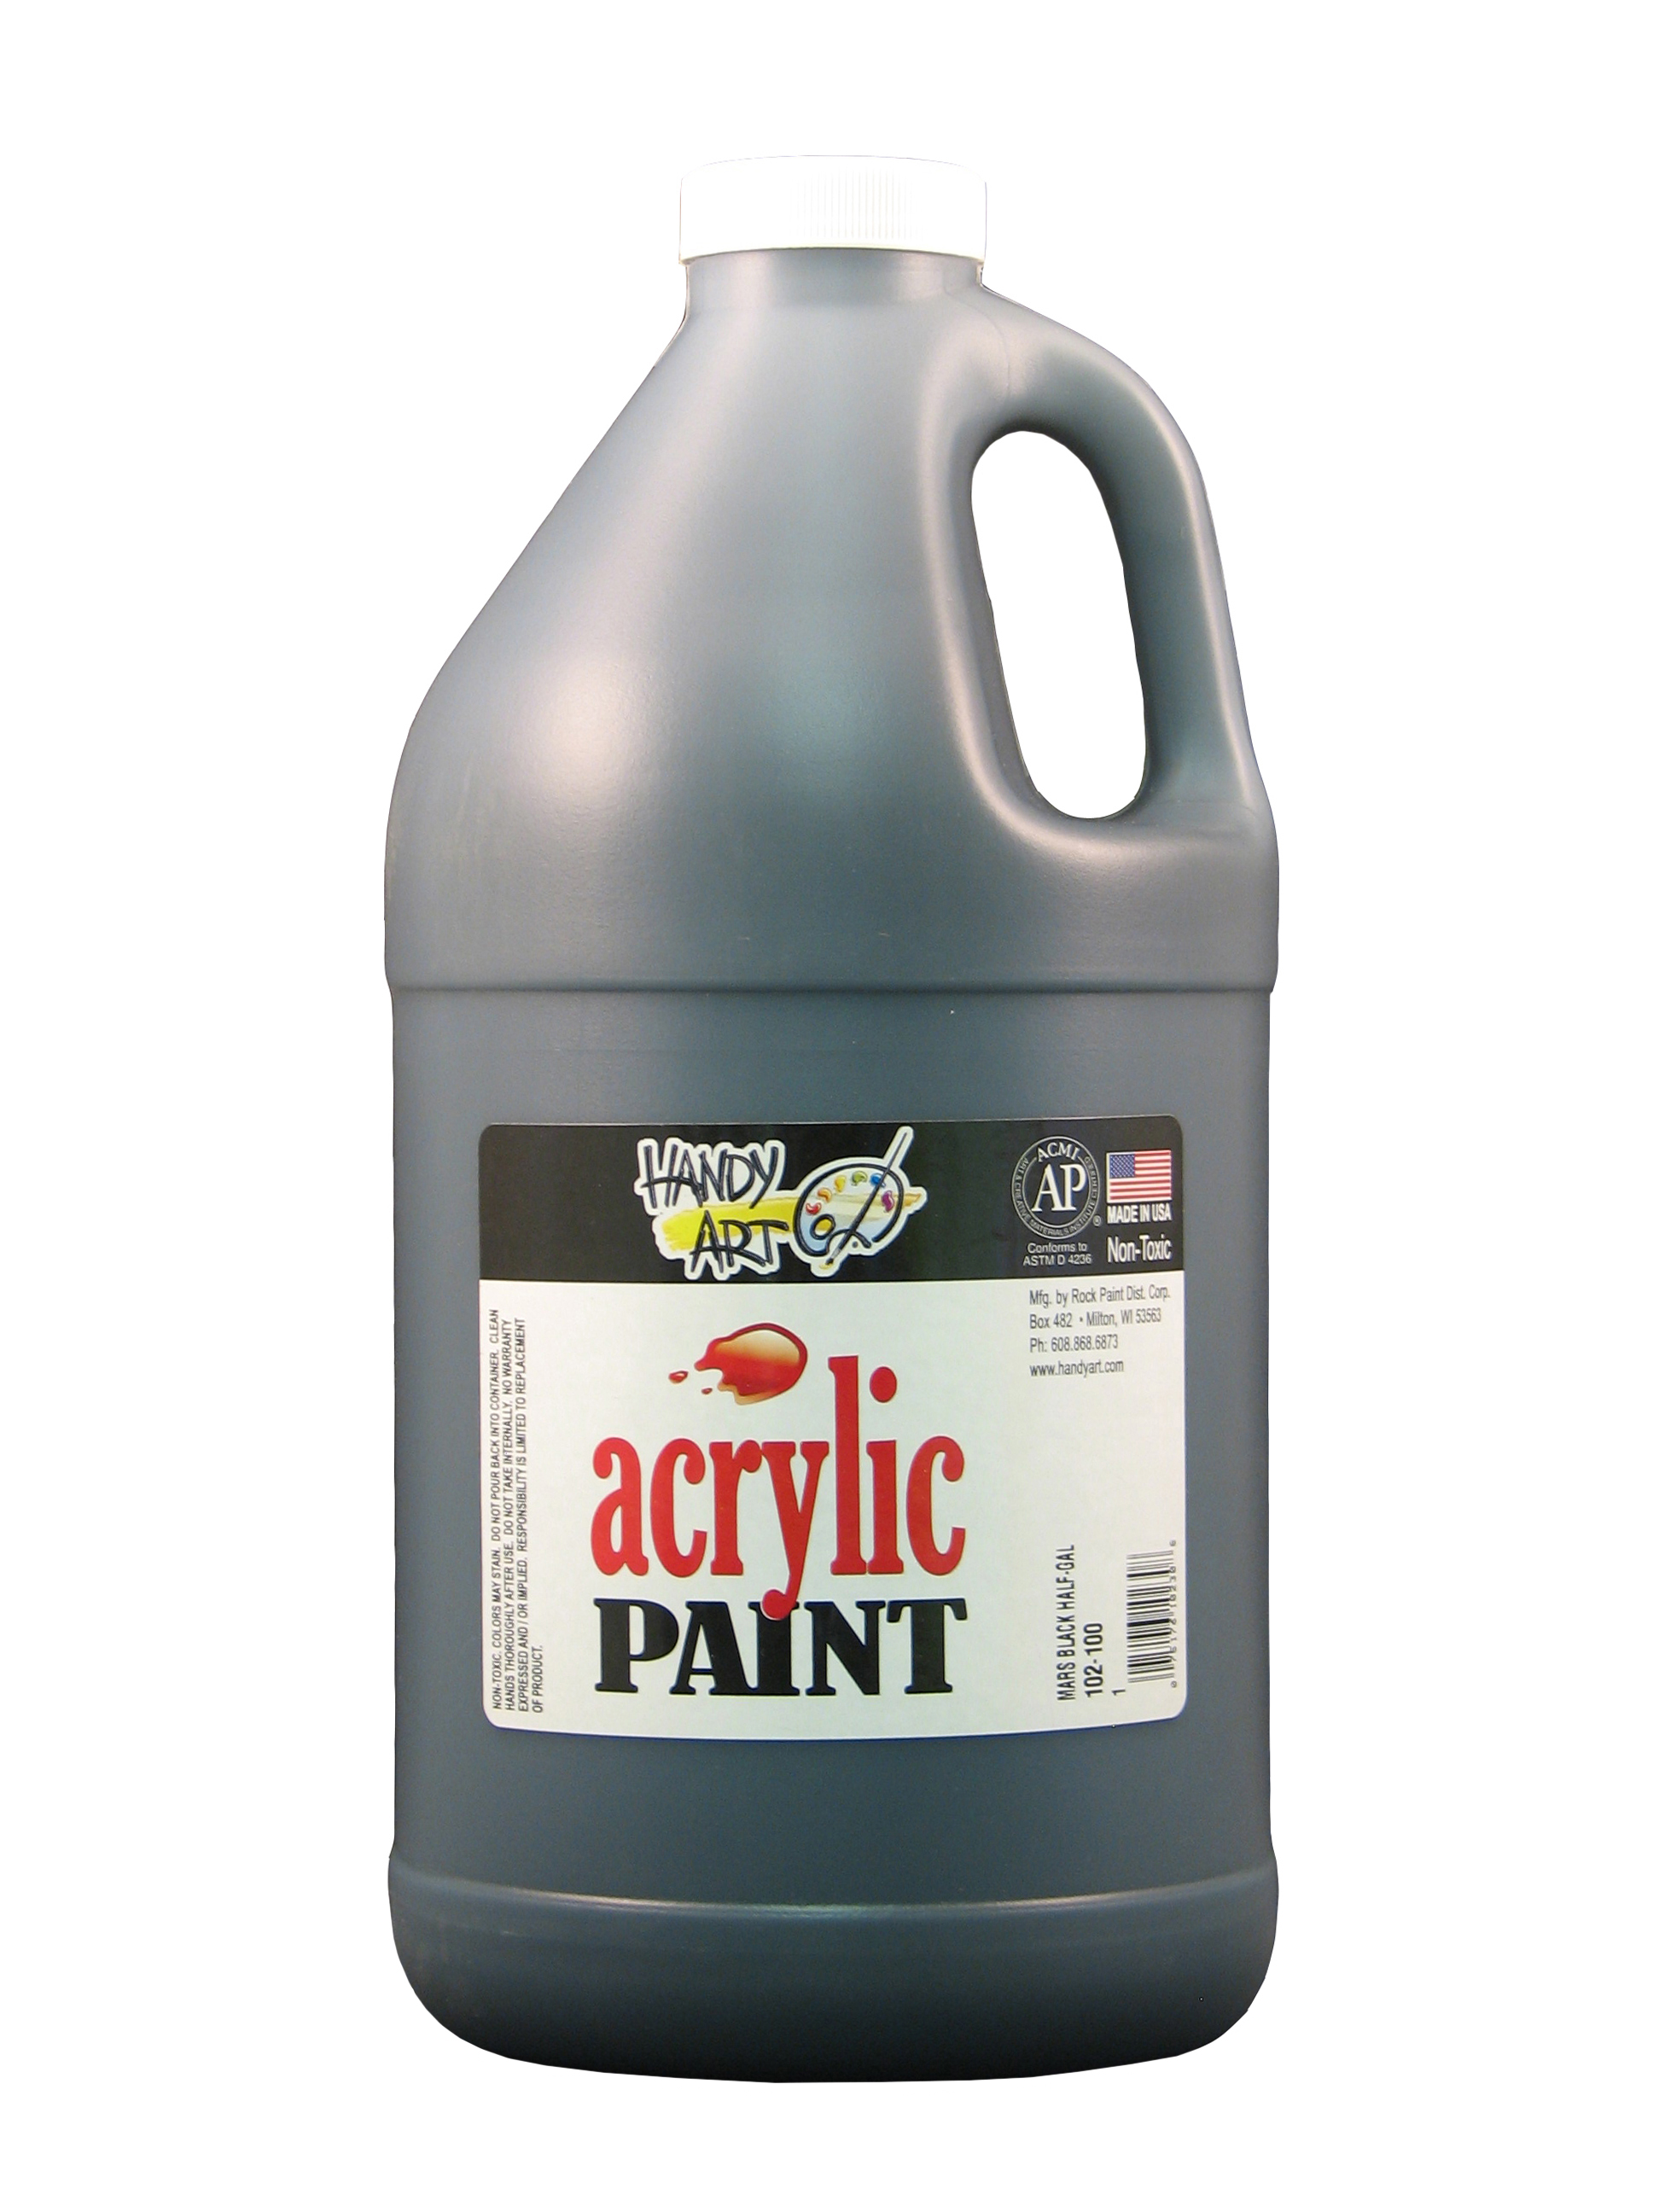 Handy Art 102100 Acrylic Paint Black - 1/2 Gallon